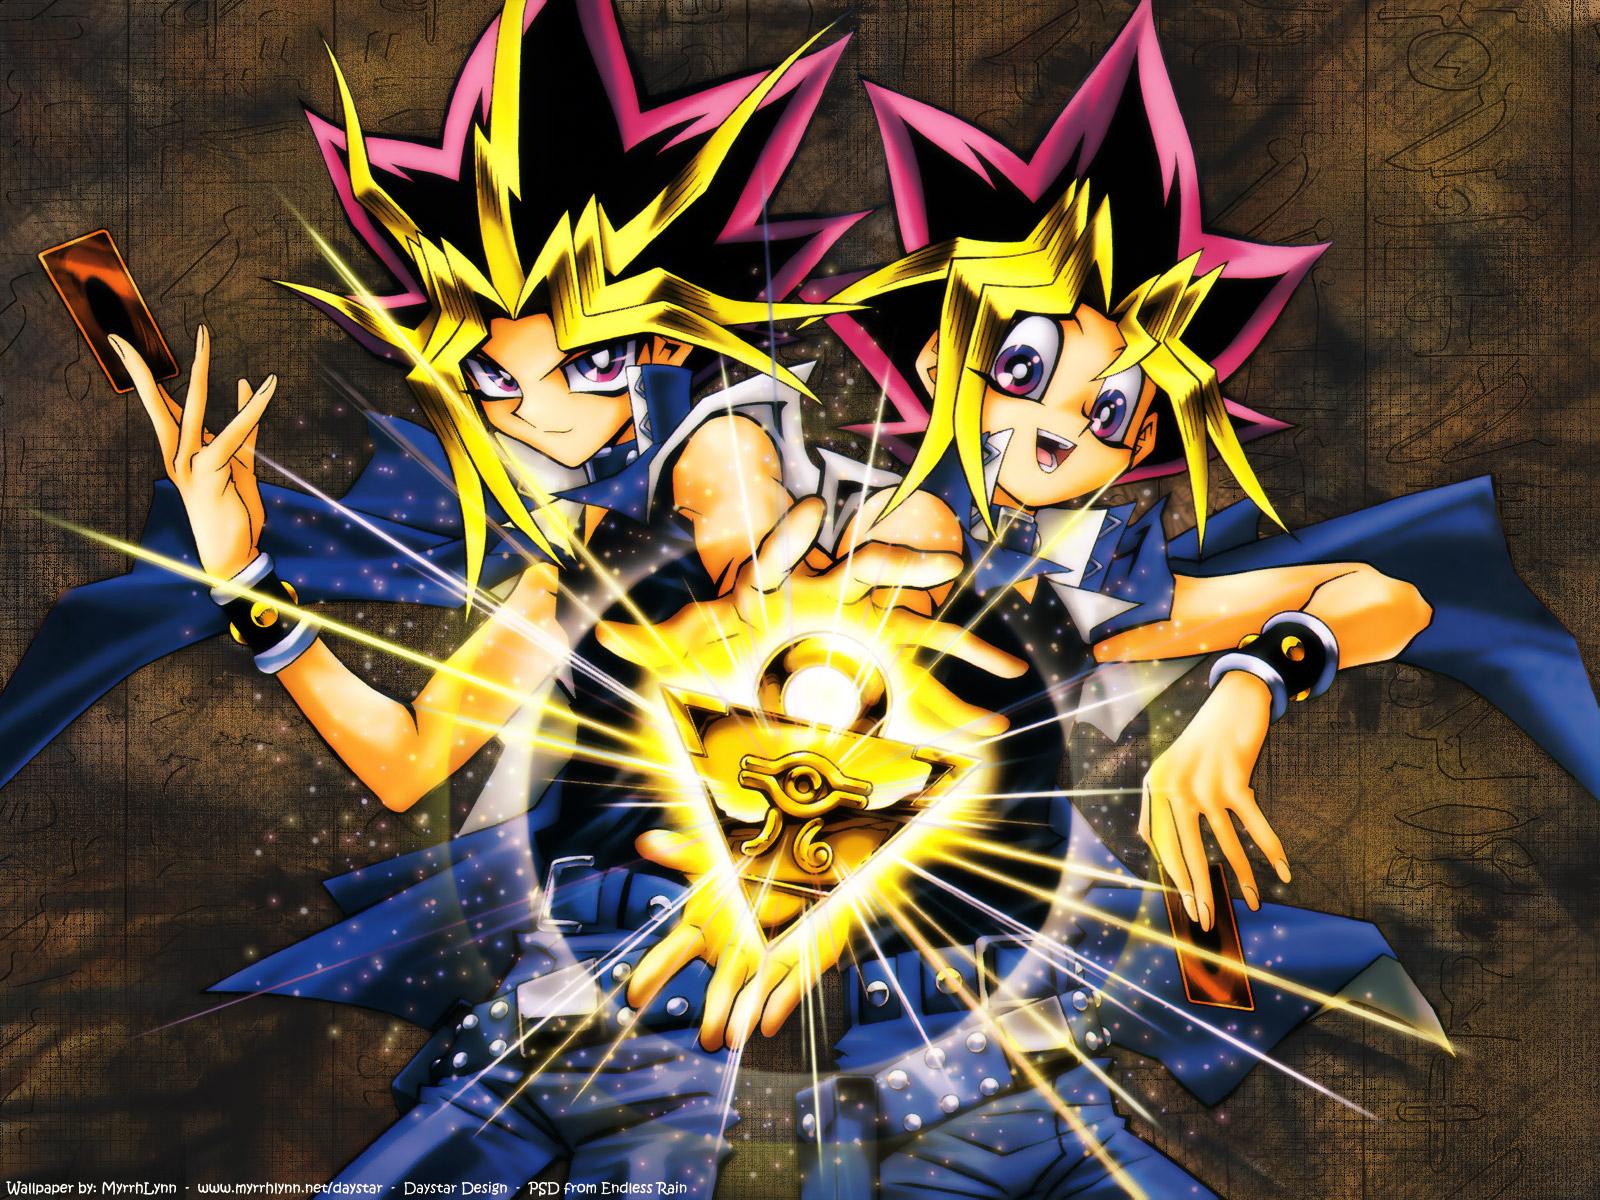 Yu Gi Oh Duel Monsters Wallpaper Yu Gi Oh   Minitokyo 1600x1200